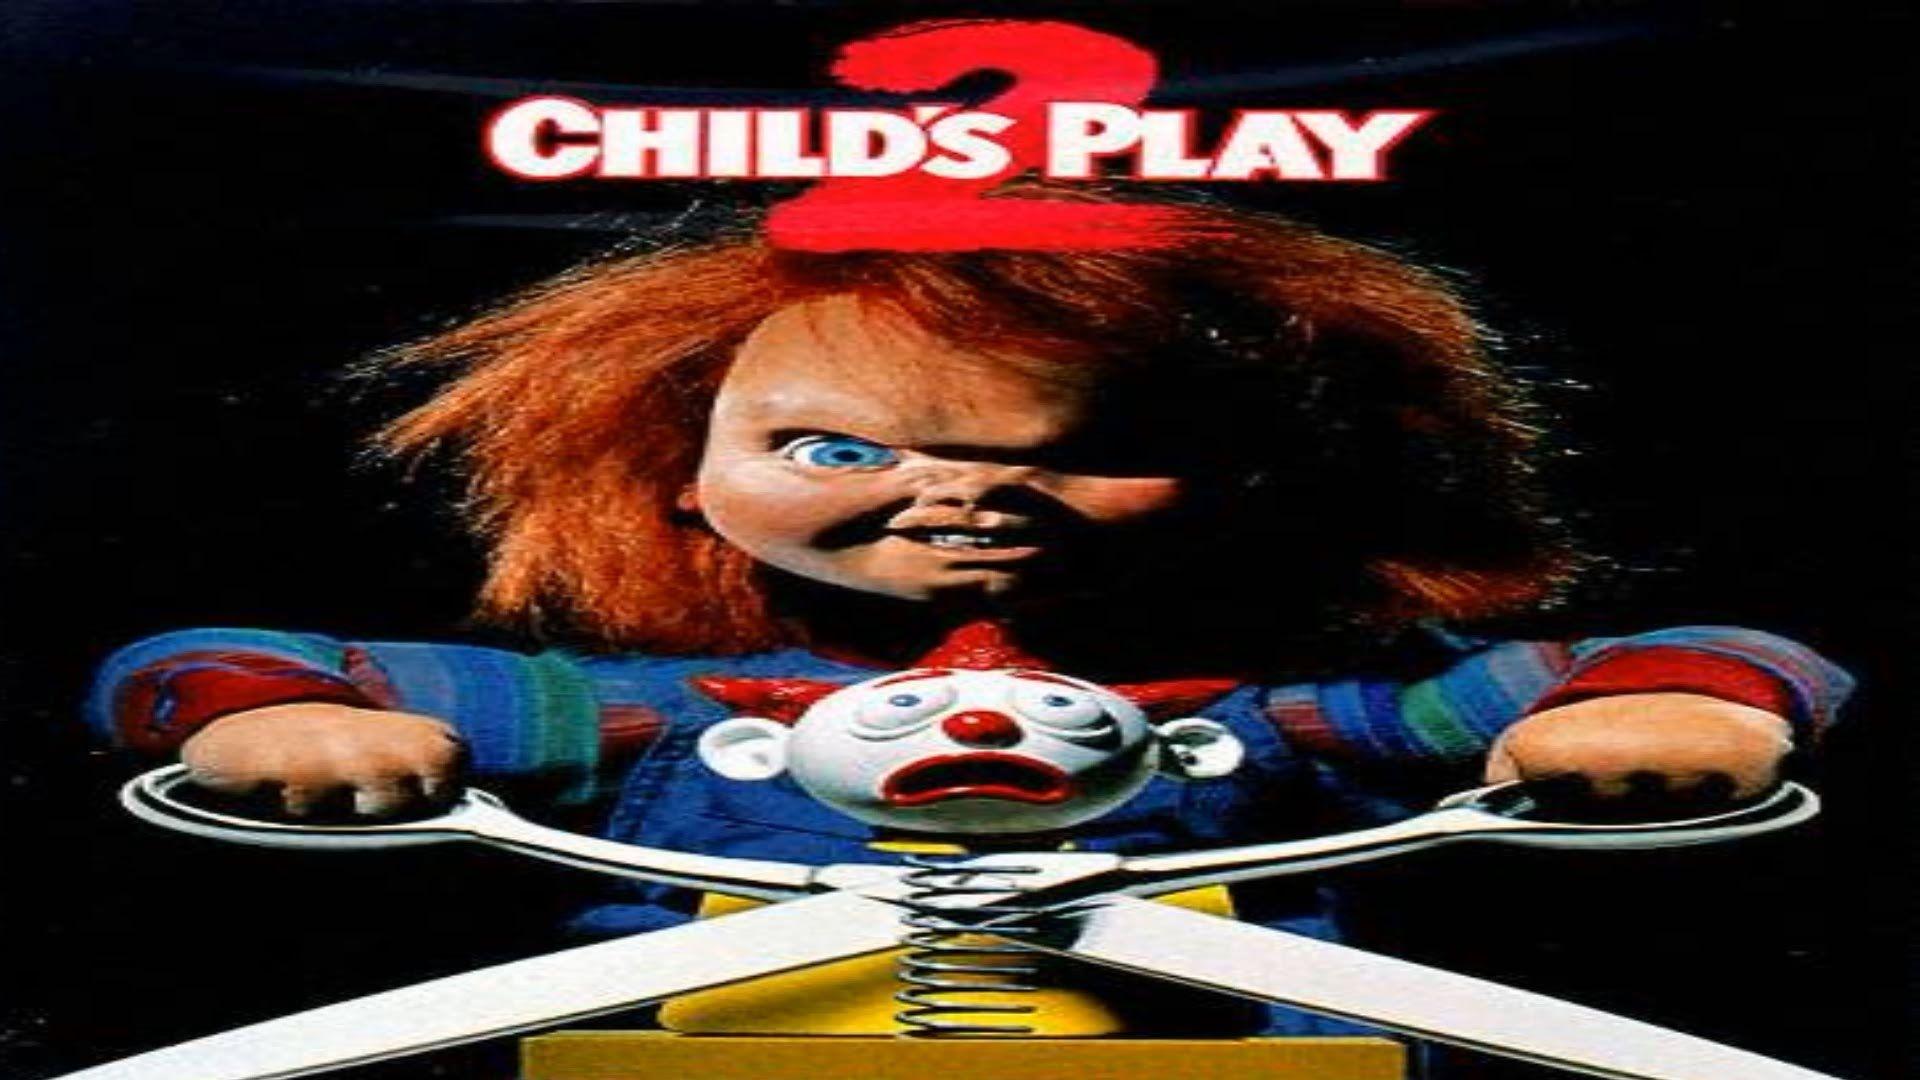 Chucky El Muñeco Diabólico 2 Tributo Youtube Child S Play Movie Kids Playing Chucky Movies